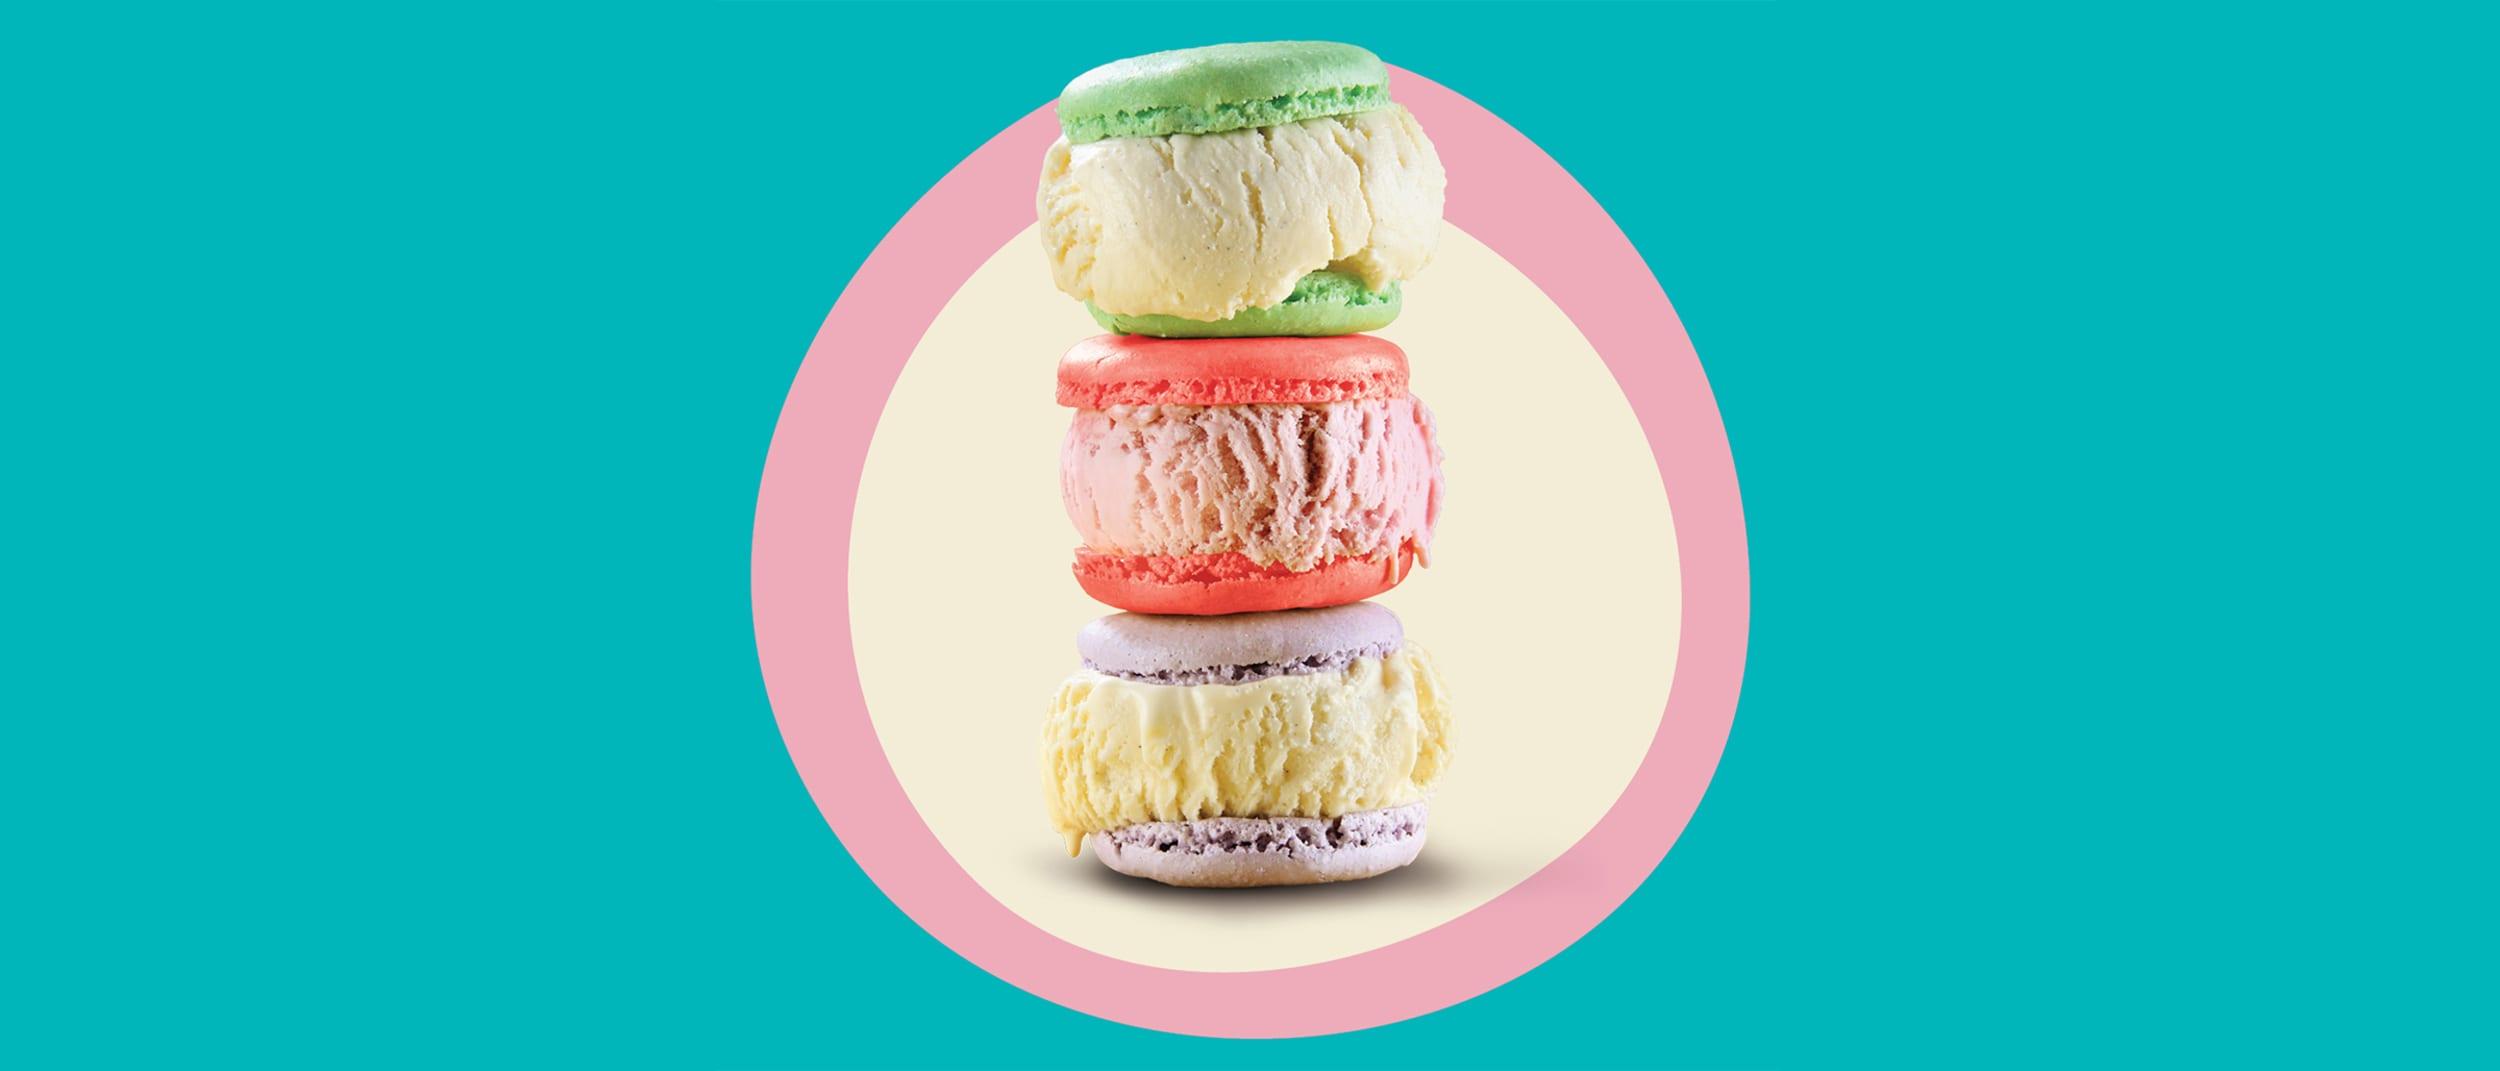 New Zealand Natural: $5 ice cream macarons